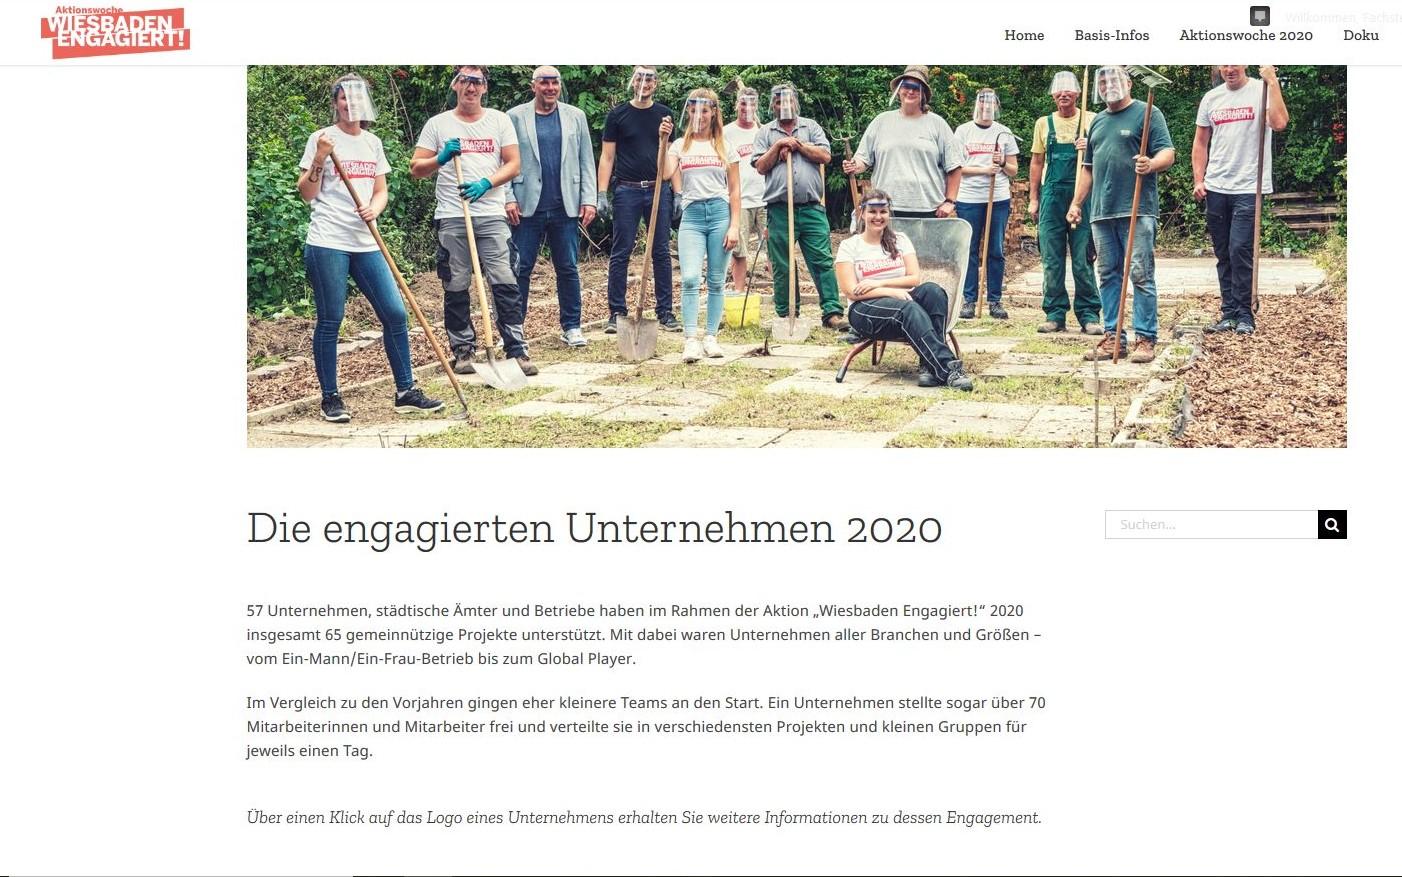 Screeenshot engagierte Unternehmen Doku 2020